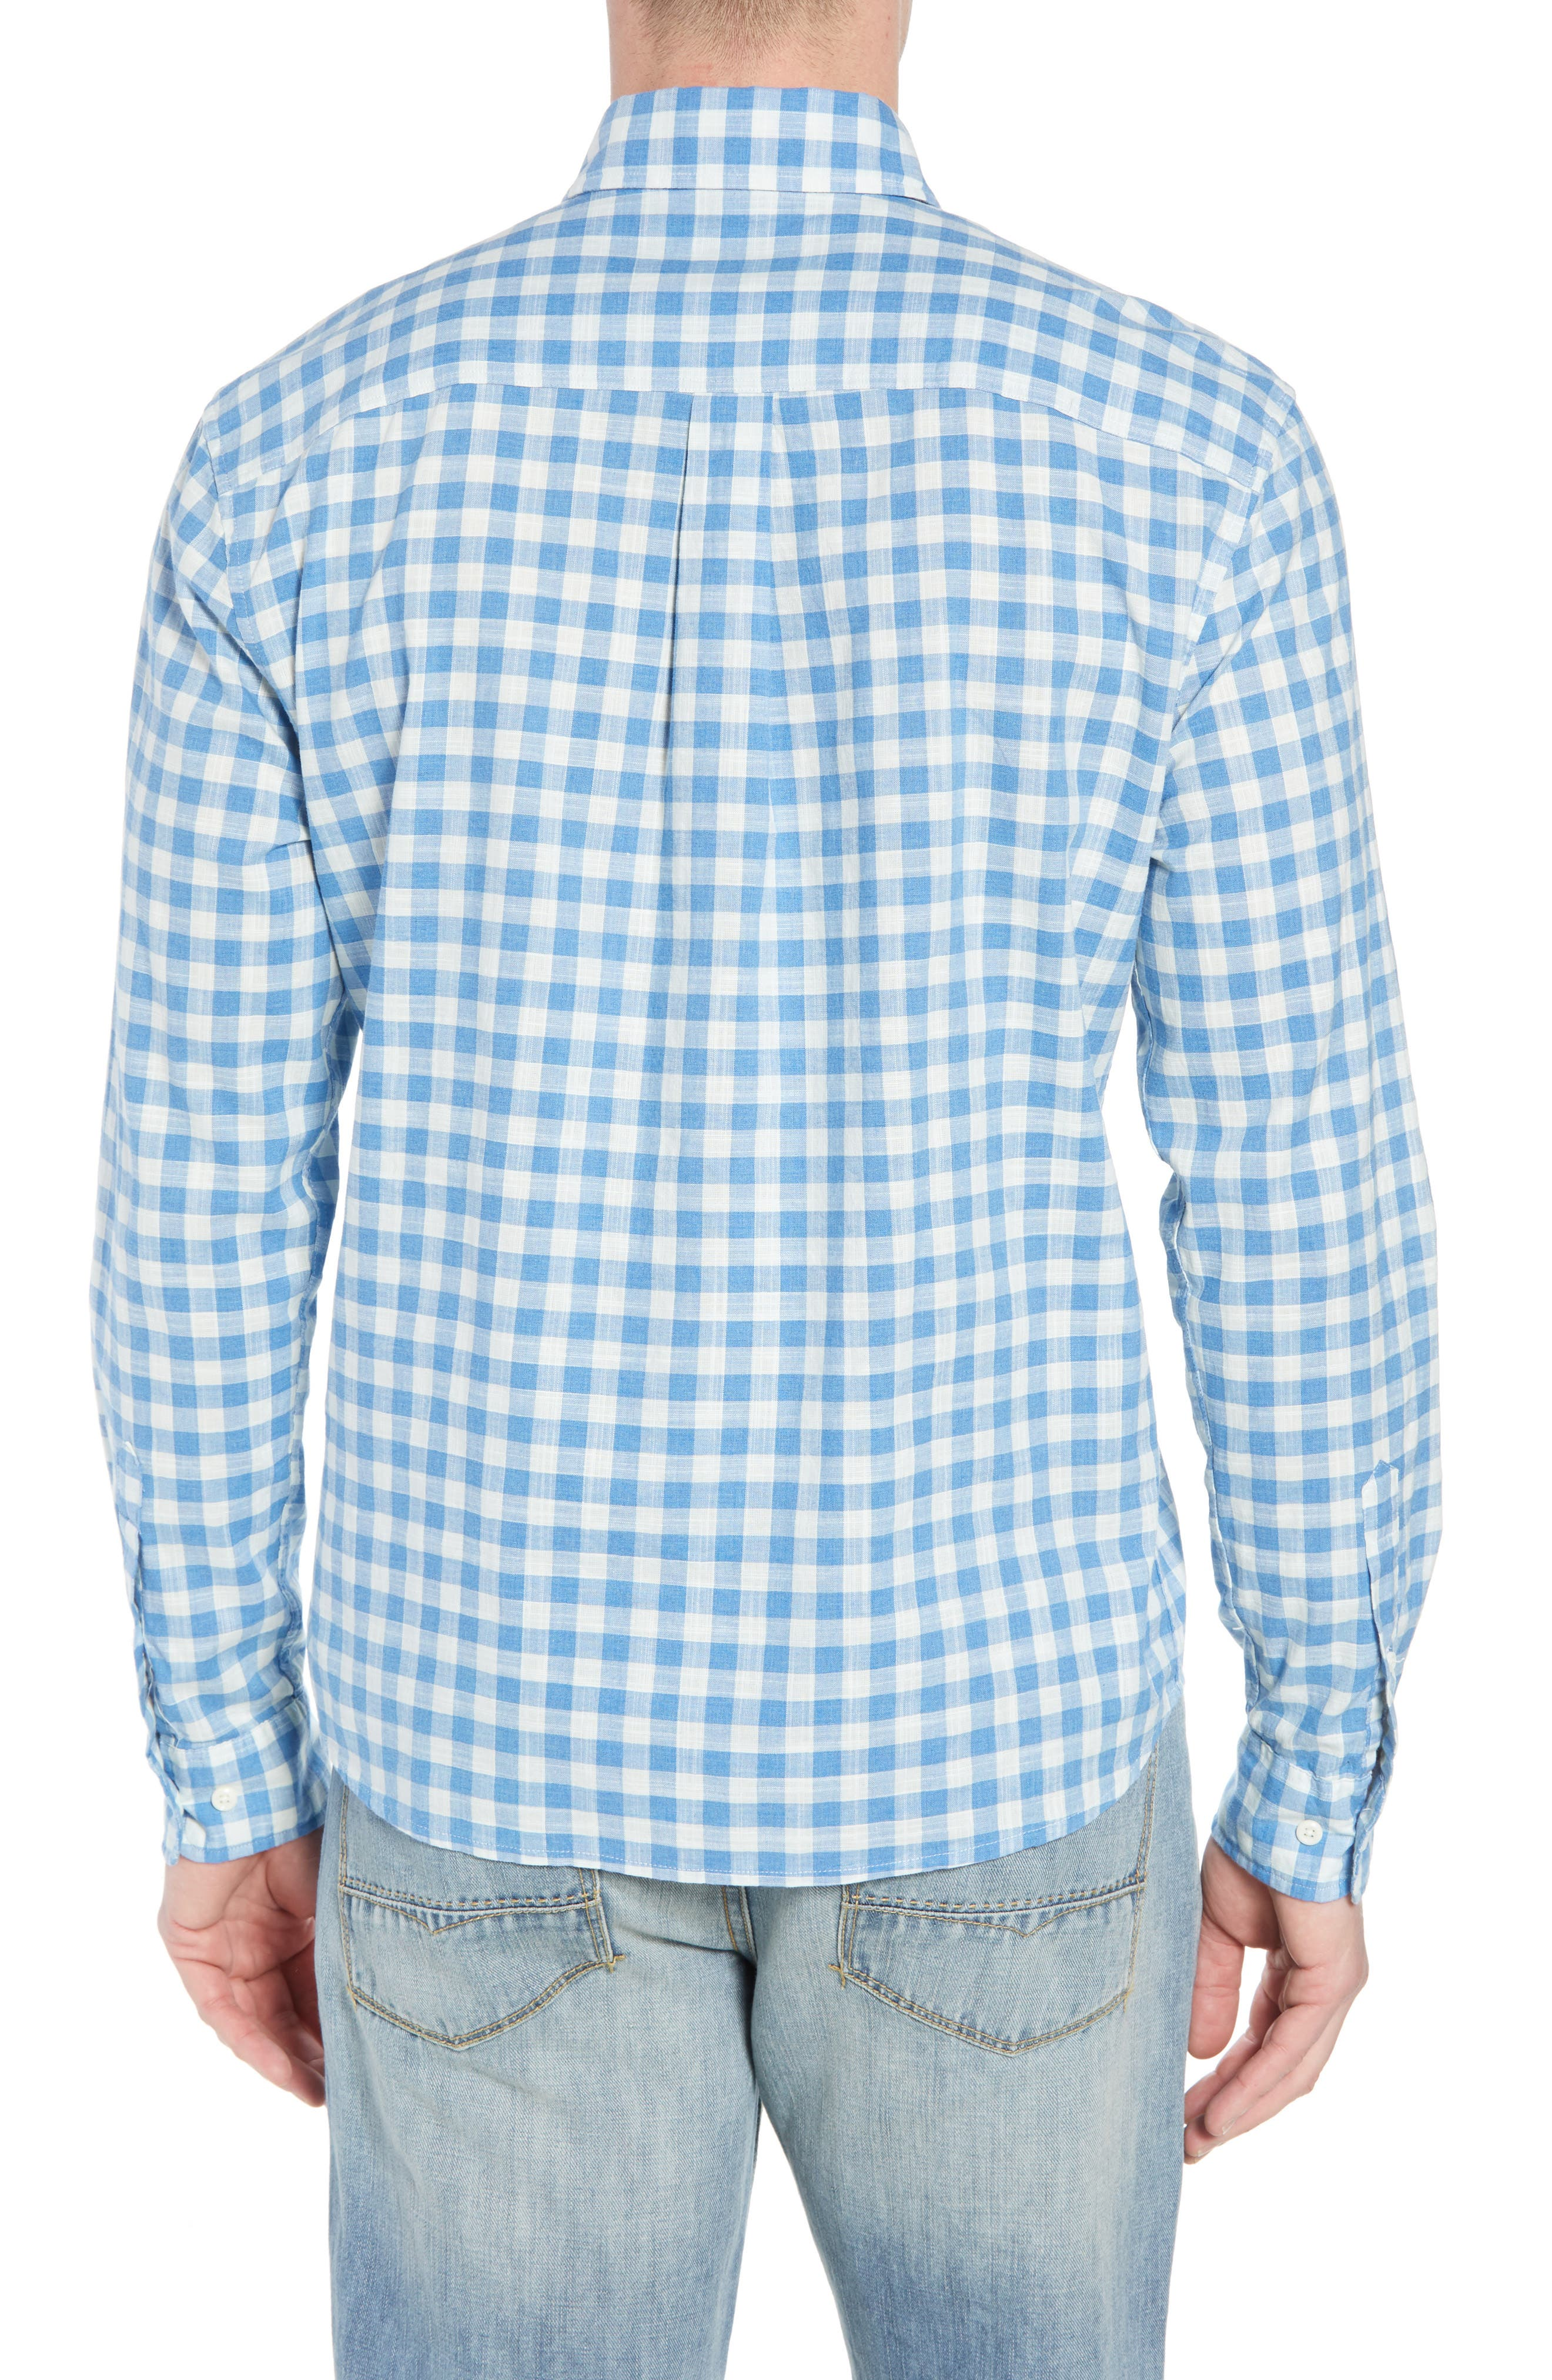 Watts Regular Fit Sport Shirt,                             Alternate thumbnail 3, color,                             Regatta